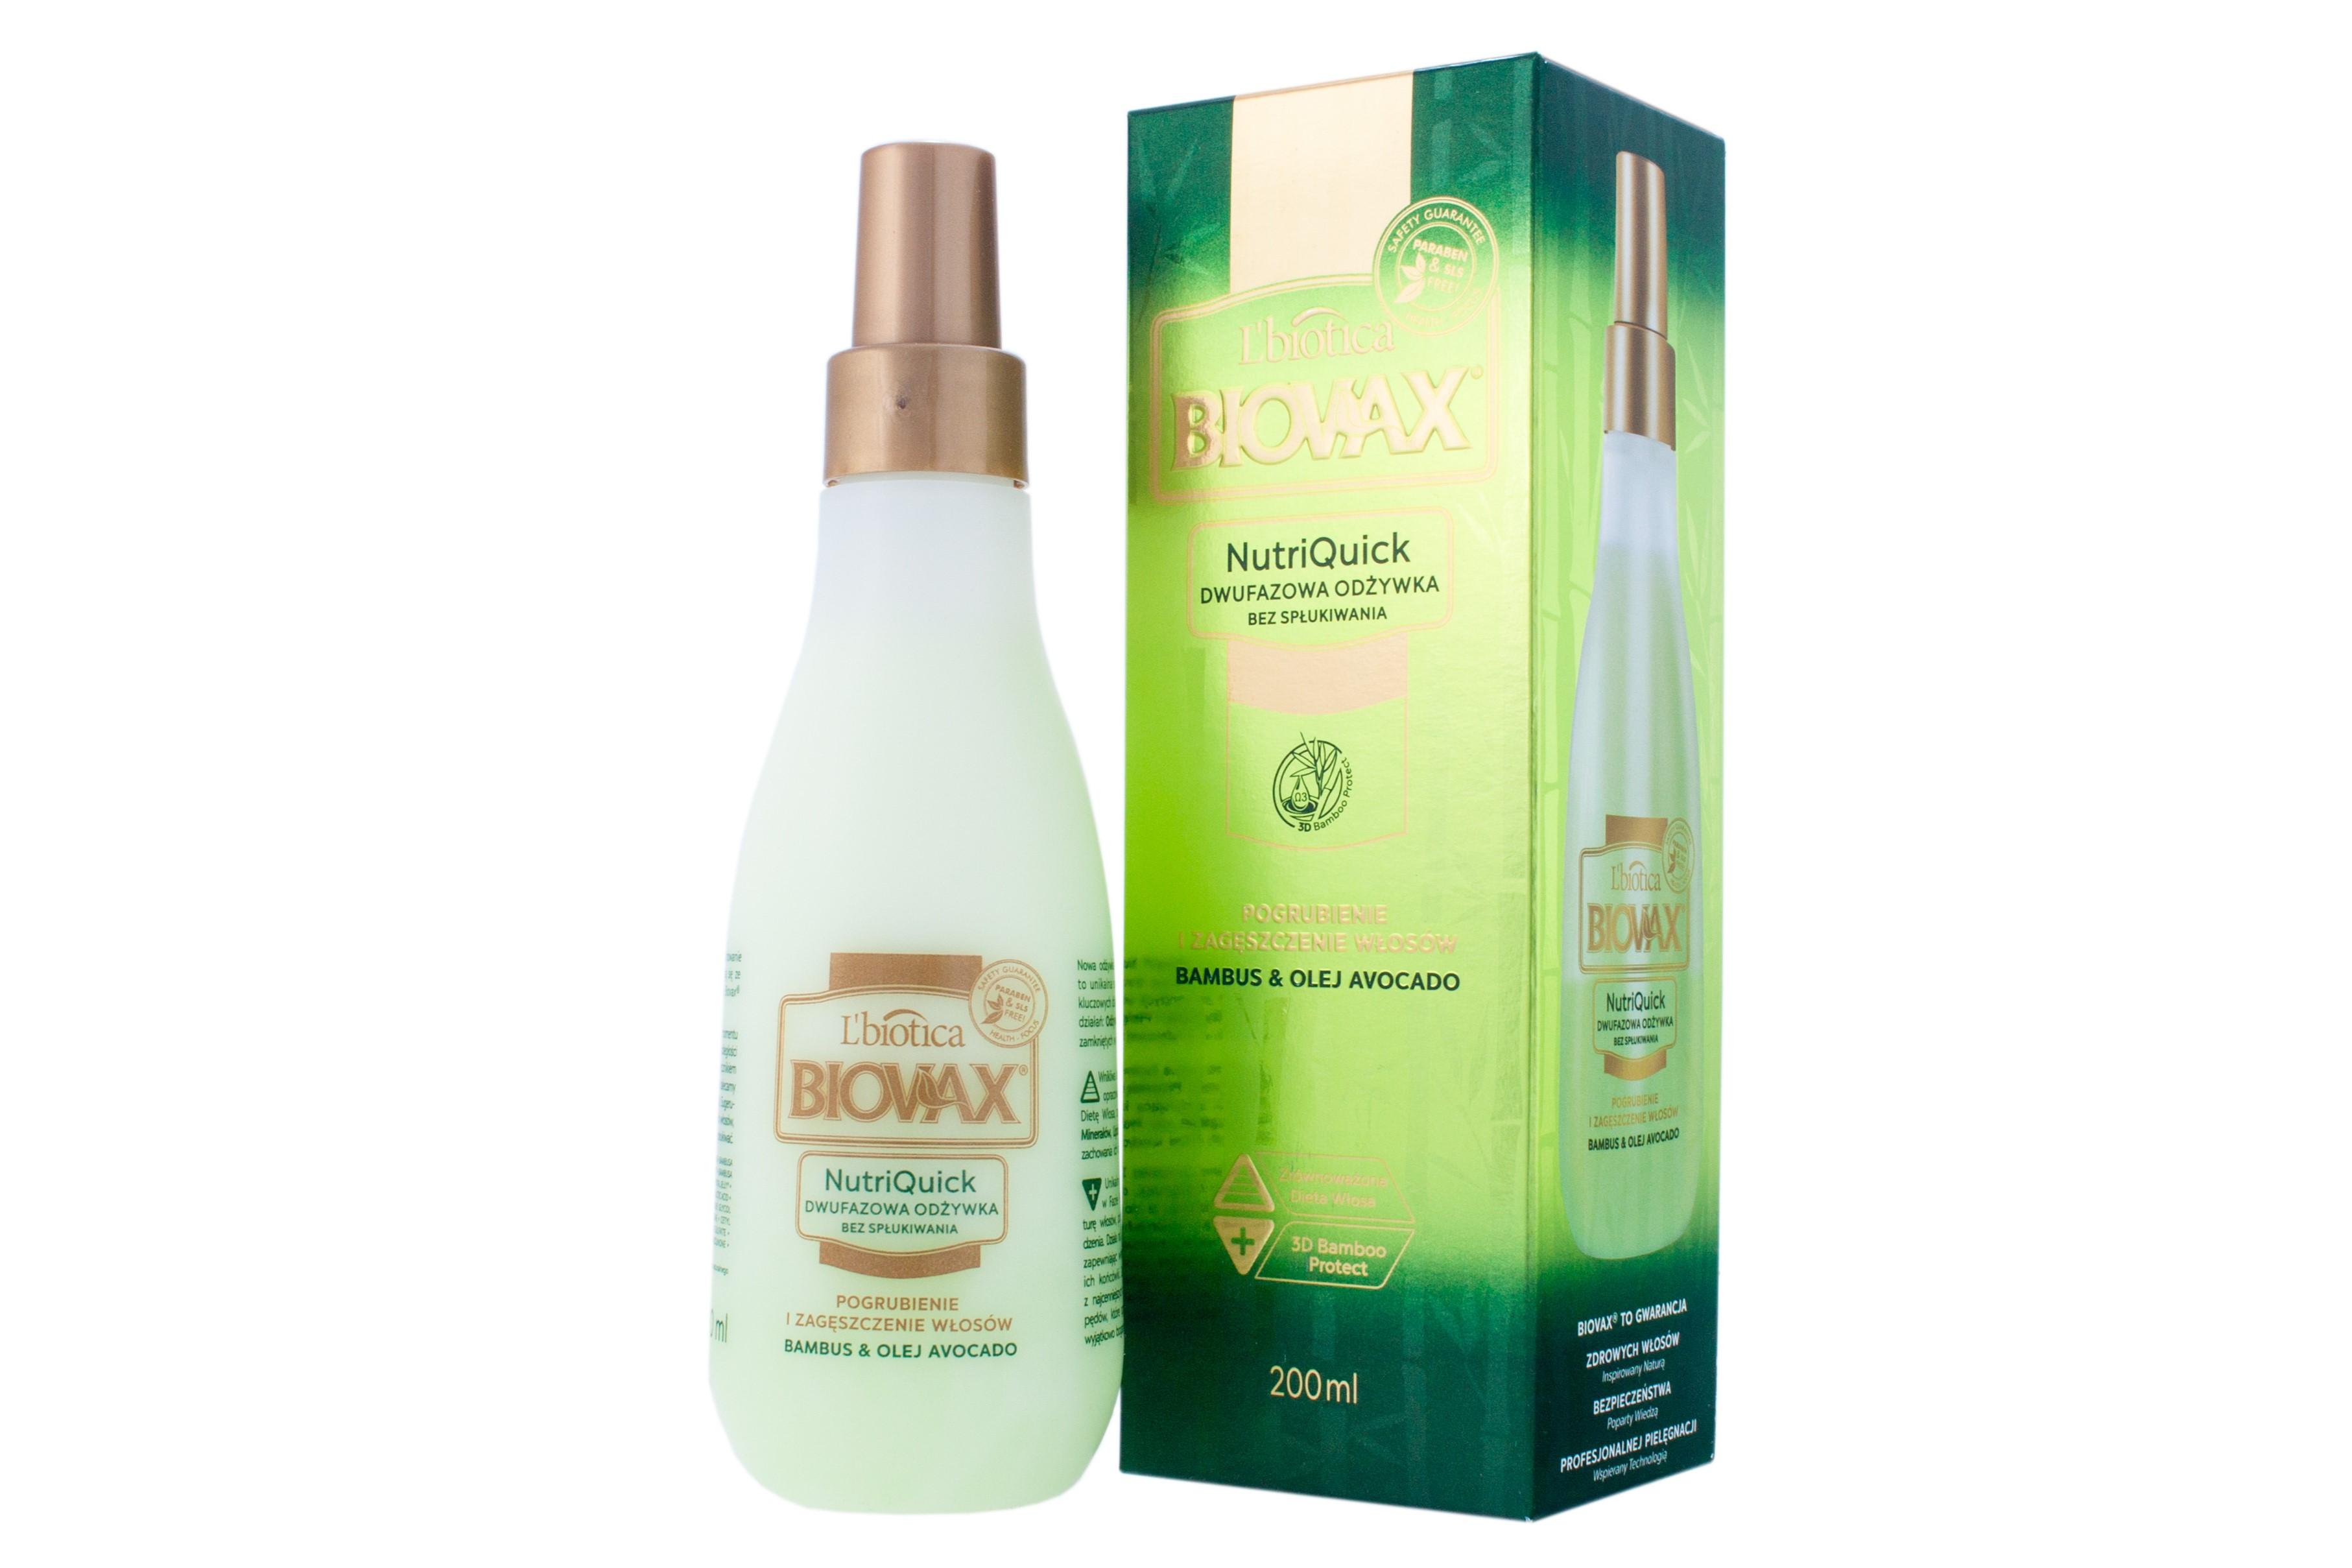 lbiotica-biovax-bambus-and-avocado